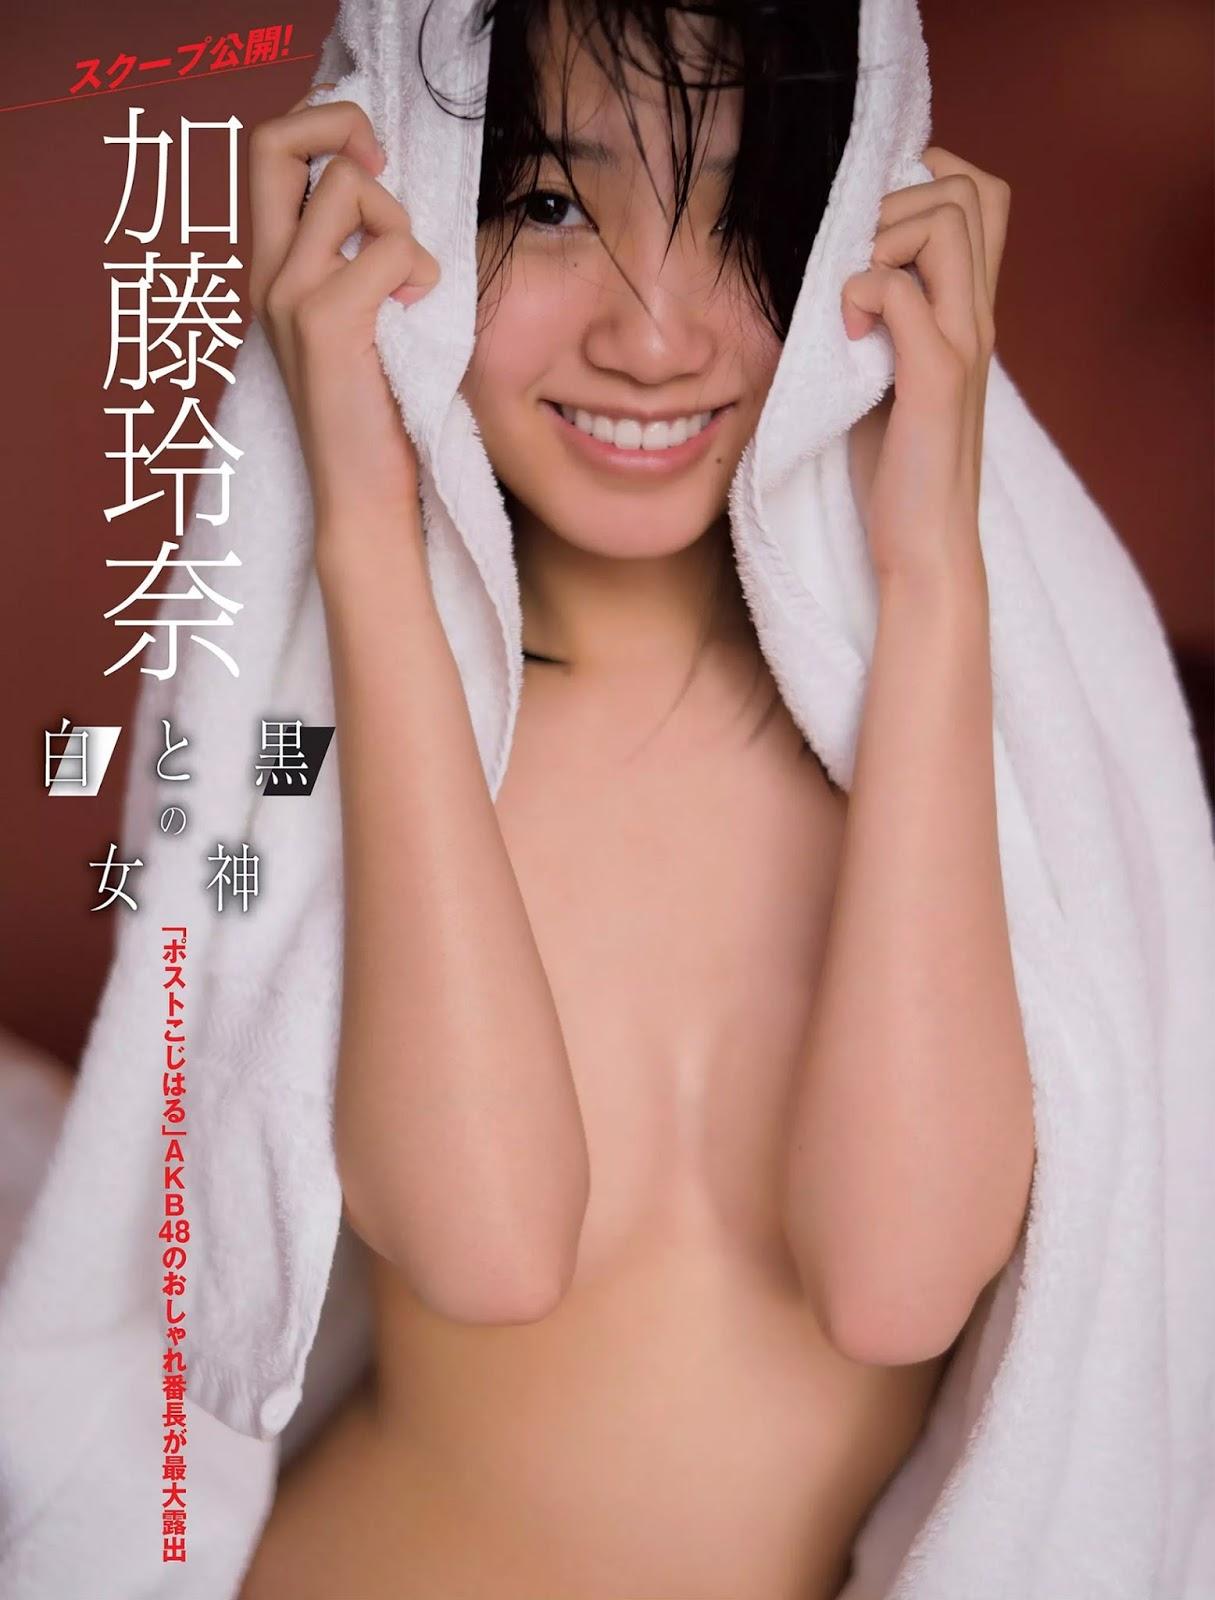 Kato Rena 加藤玲奈, FLASH 2018.04.10 (フラッシュ 2018年4月10日号)